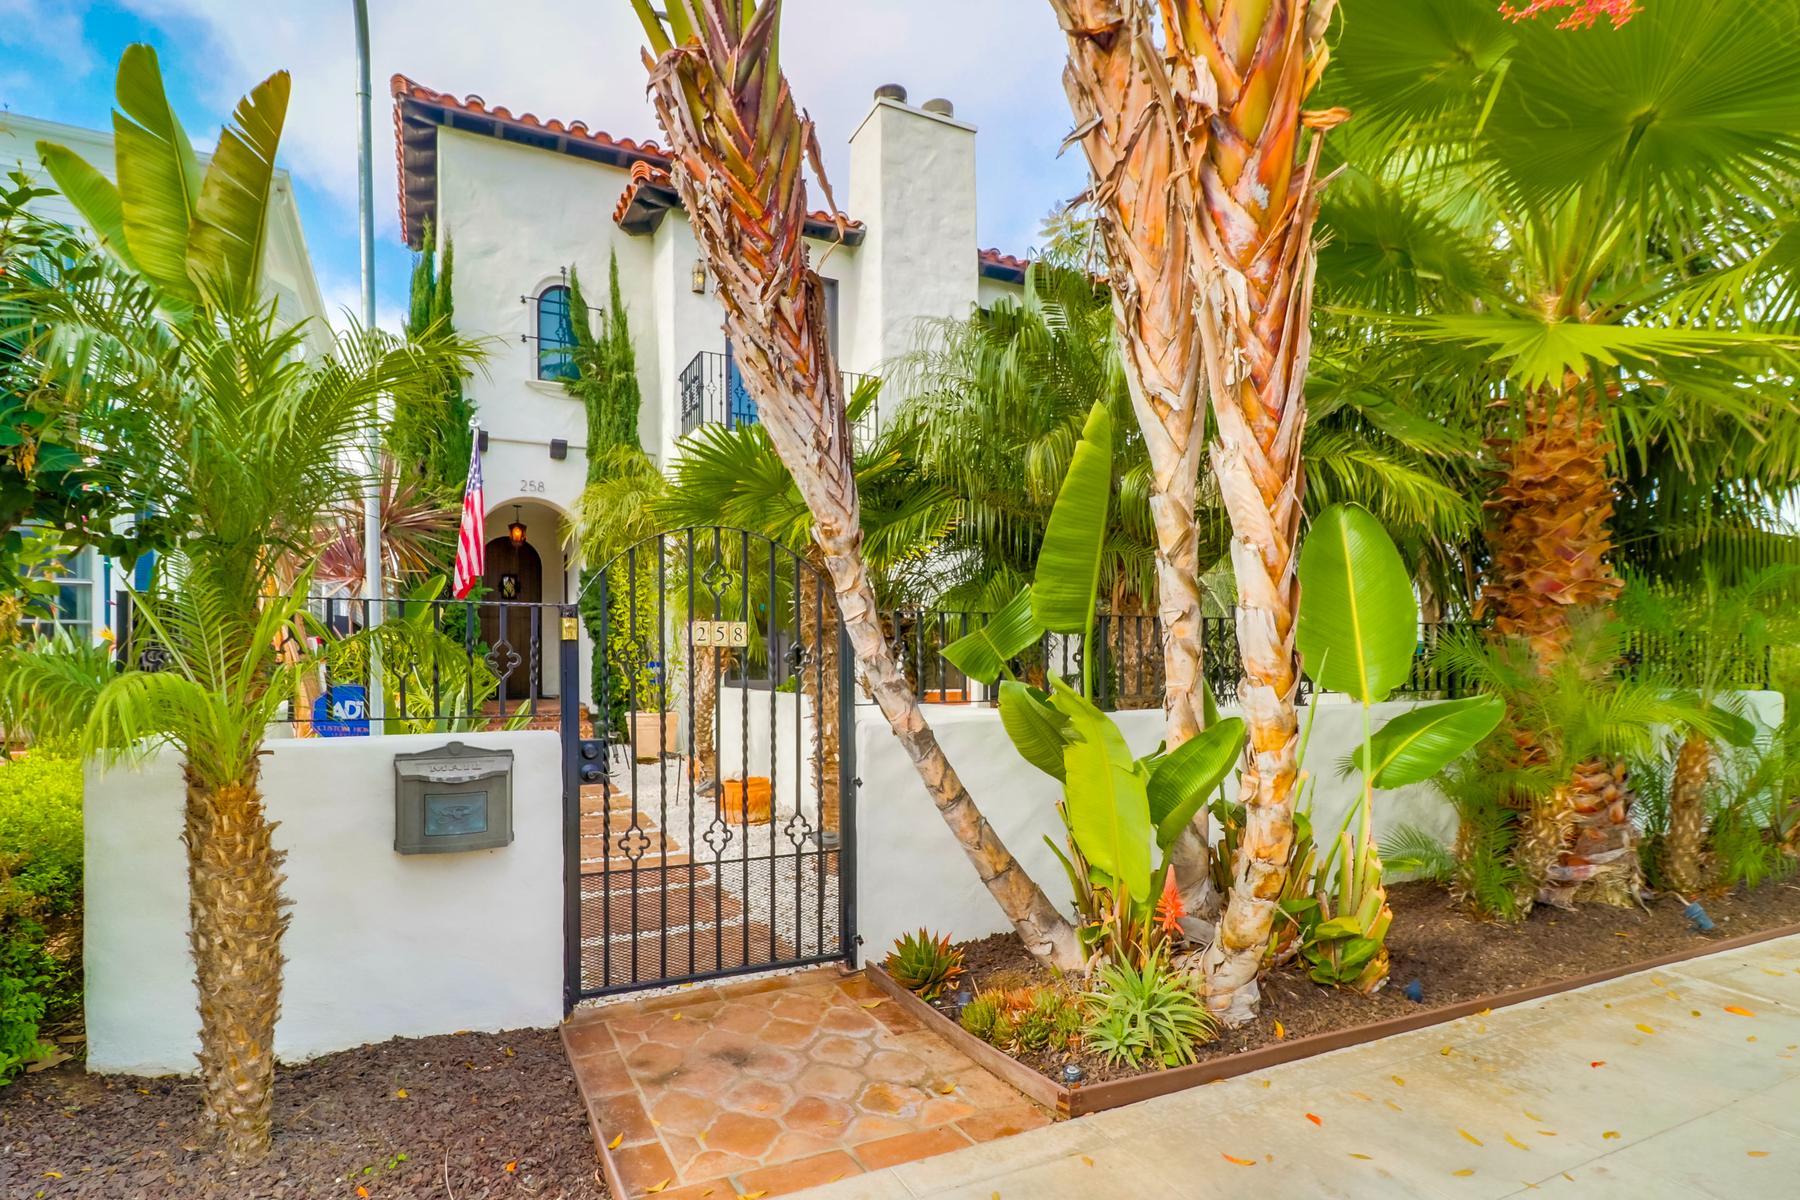 Single Family Homes for Sale at 258 H Avenue Coronado, California 92118 United States